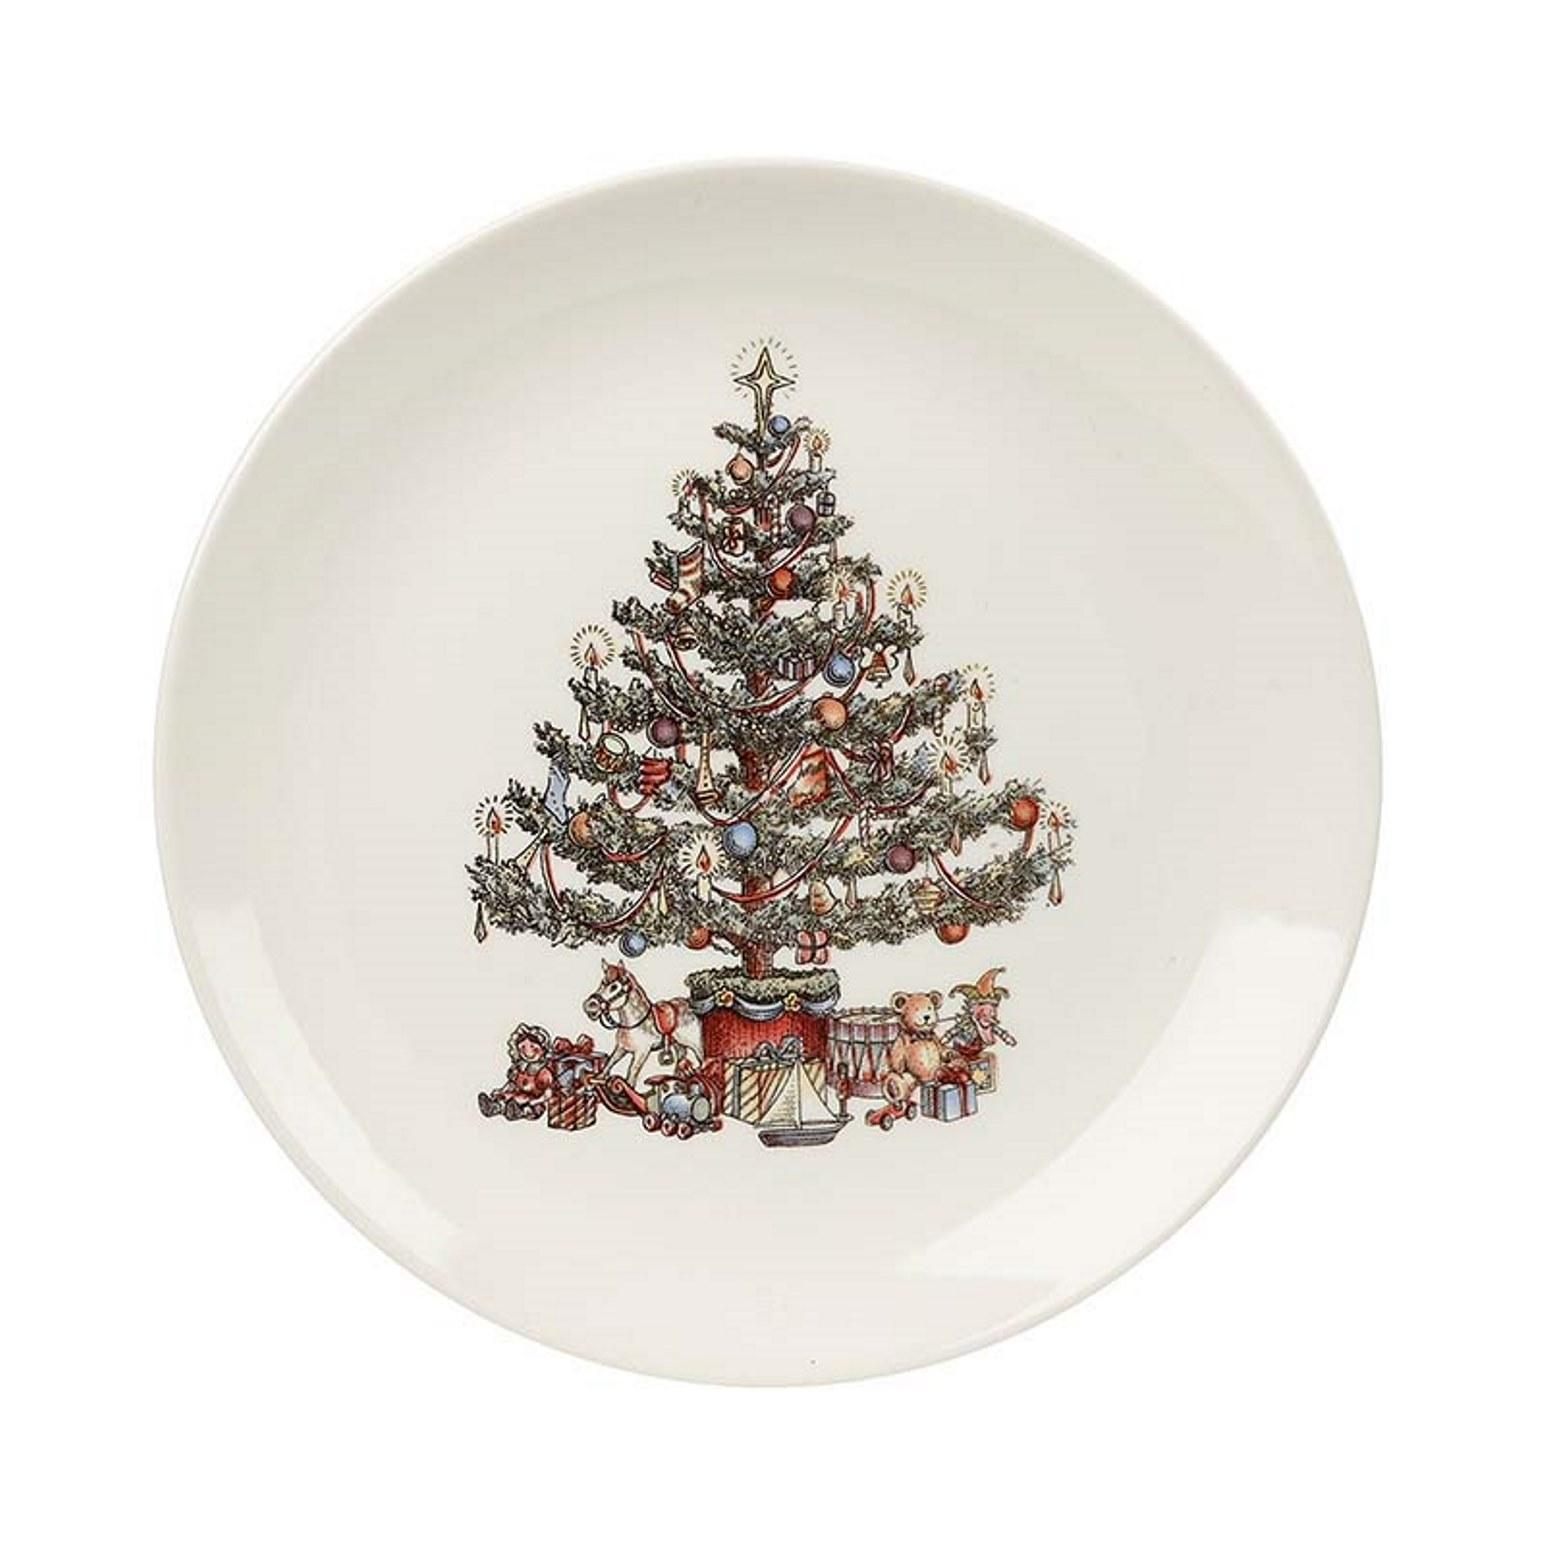 "Онлайн каталог PROMENU: Тарелка обеденная ""Новогодняя елка"" Churchill CHRISTMAS TREE, диаметр 26 см, белый                               CHTR00011"